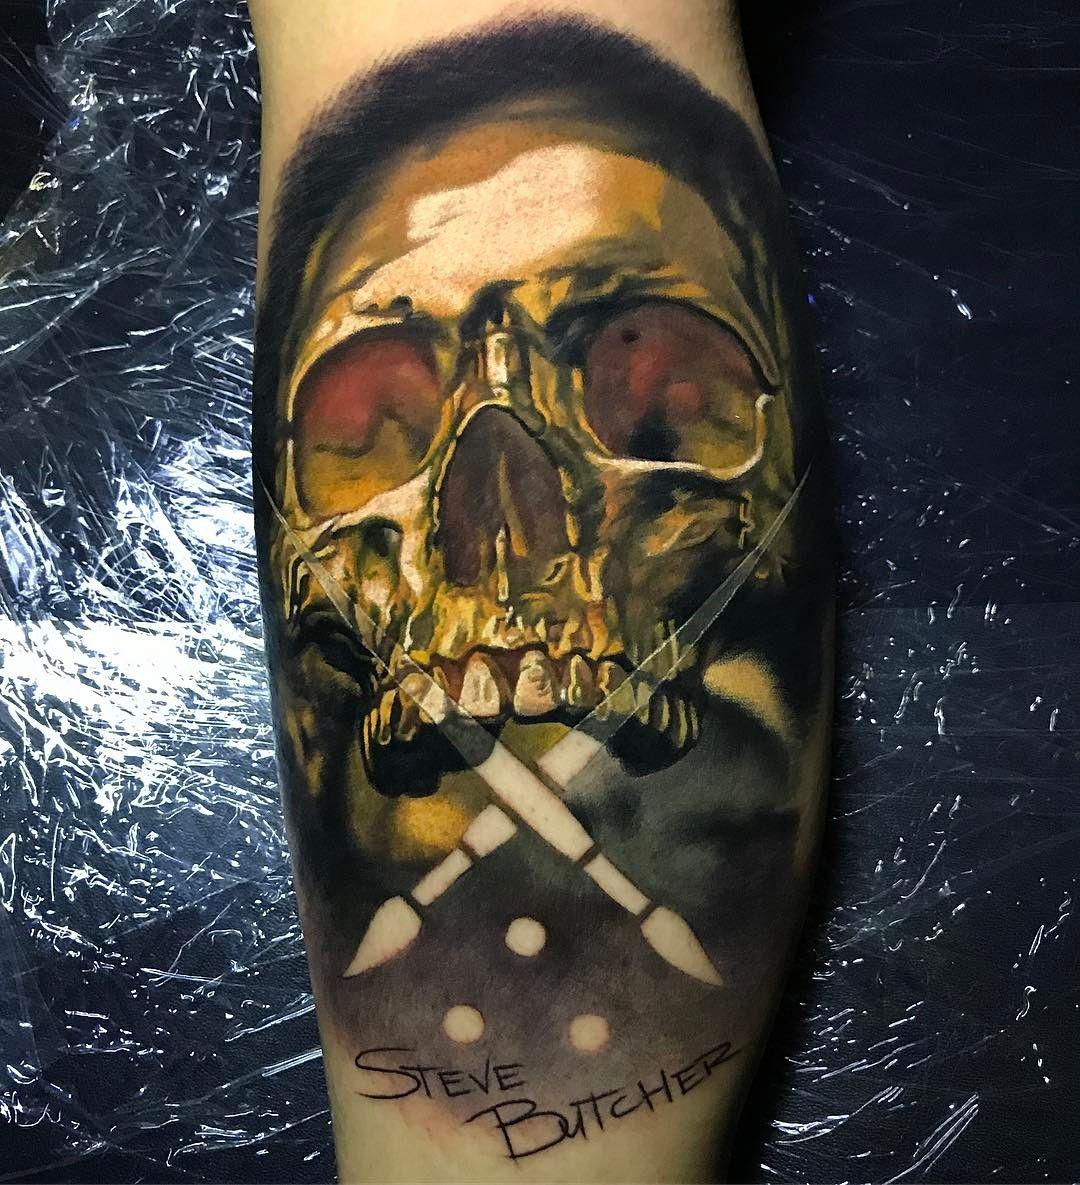 13+ Stunning Steve butcher tattoo instagram ideas in 2021